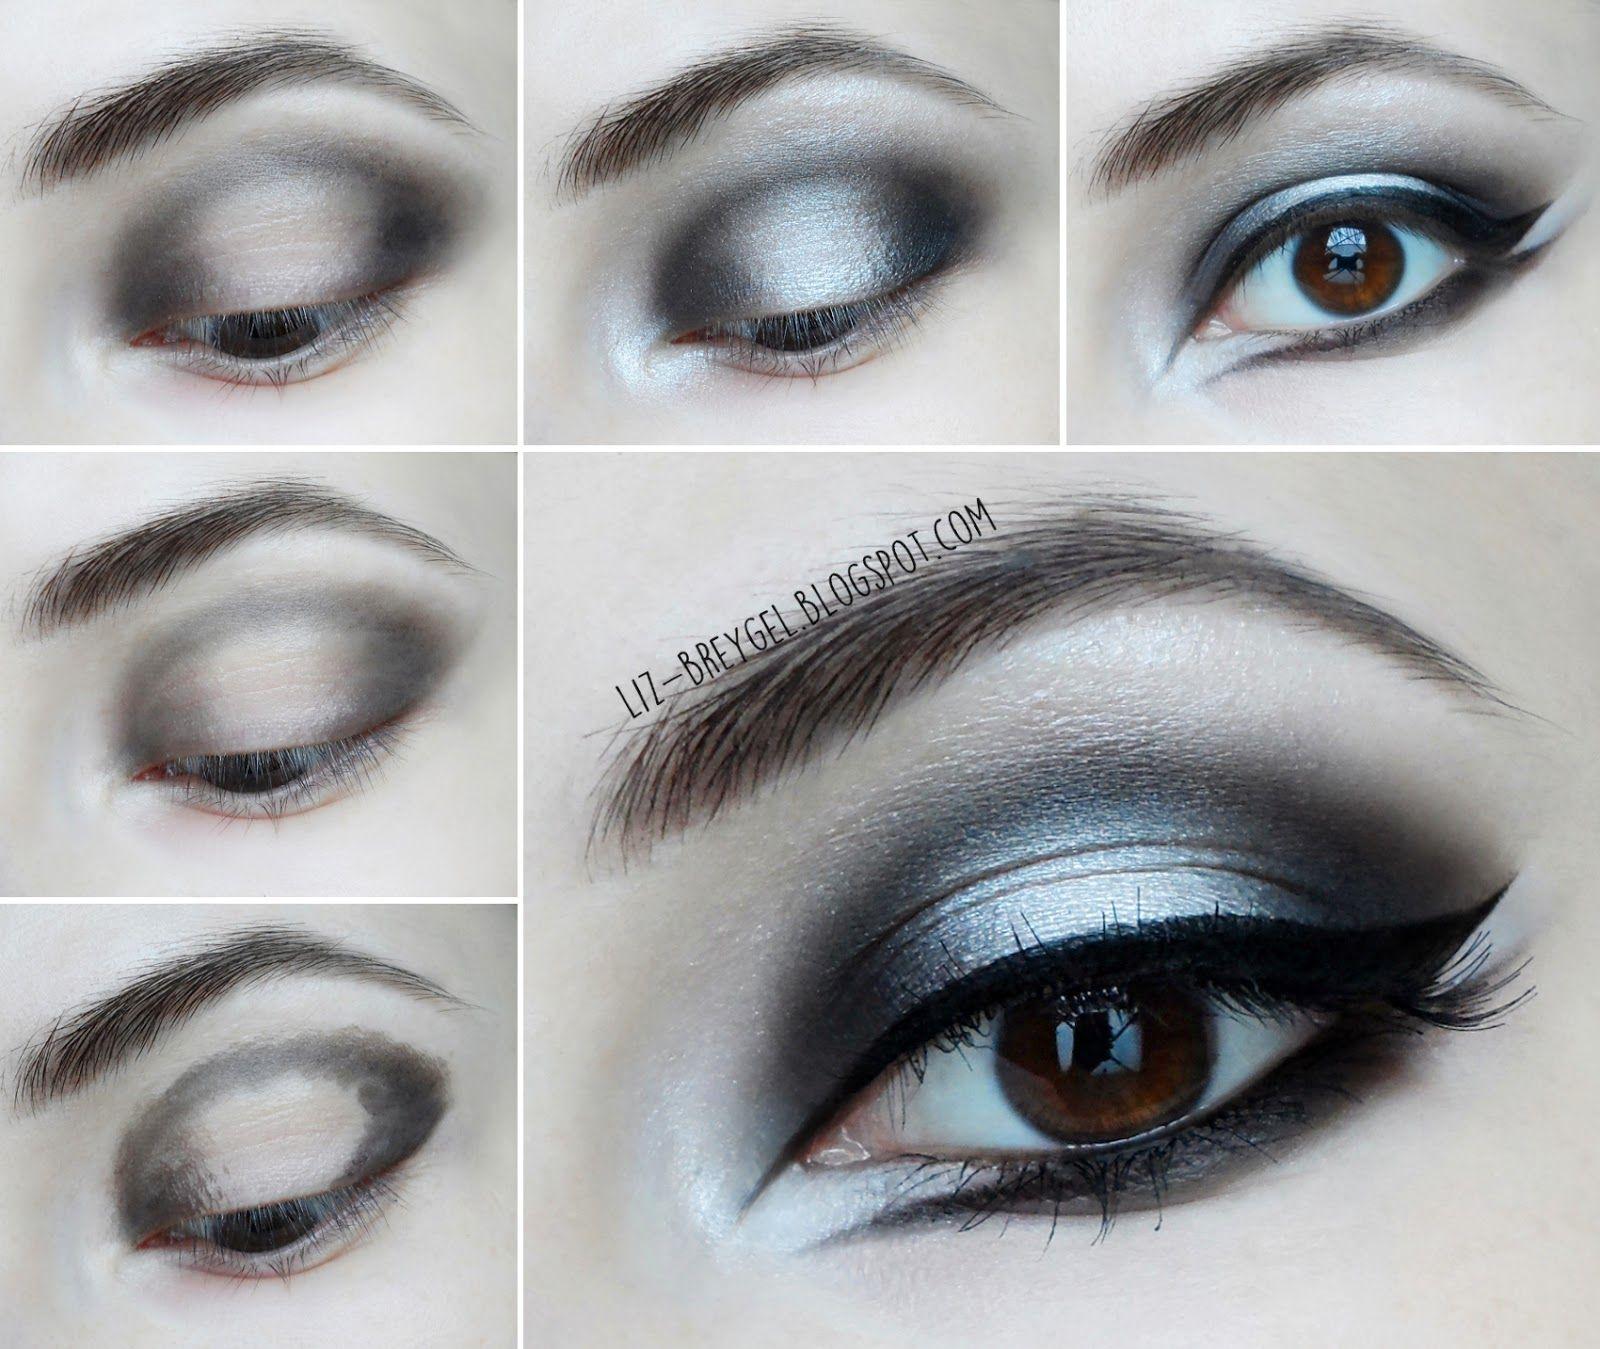 Best Halloween Smokey Eye Makeup Ideas - harrop.us - harrop.us